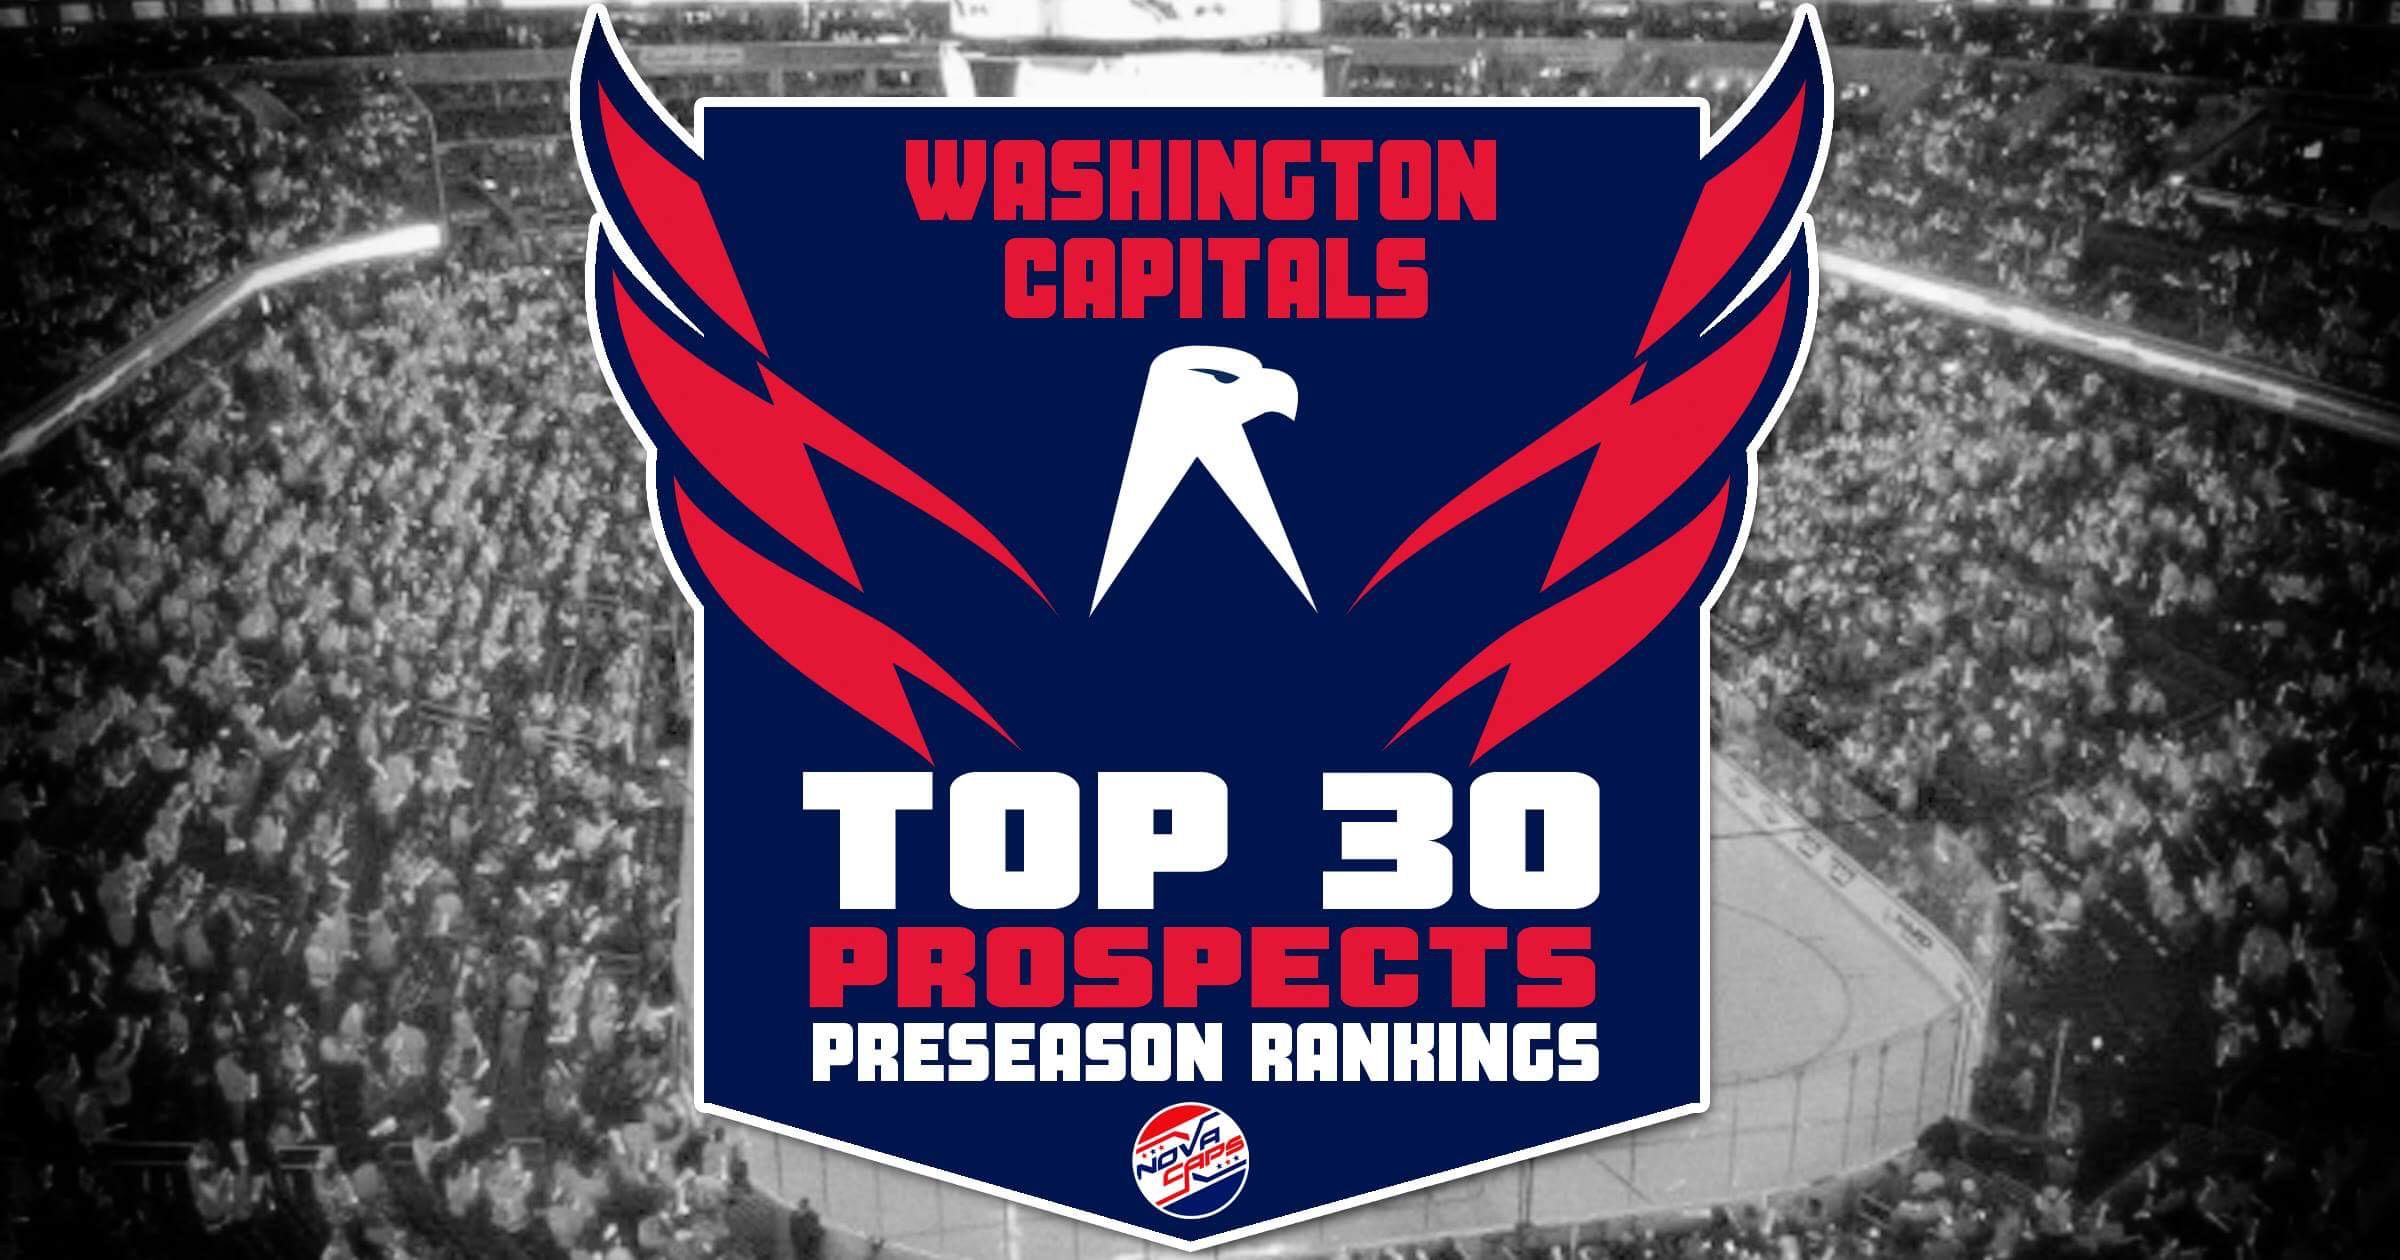 9478beed609 Washington Capitals Top-30 Prospects  2018 Preseason Rankings  Part 2   1-15